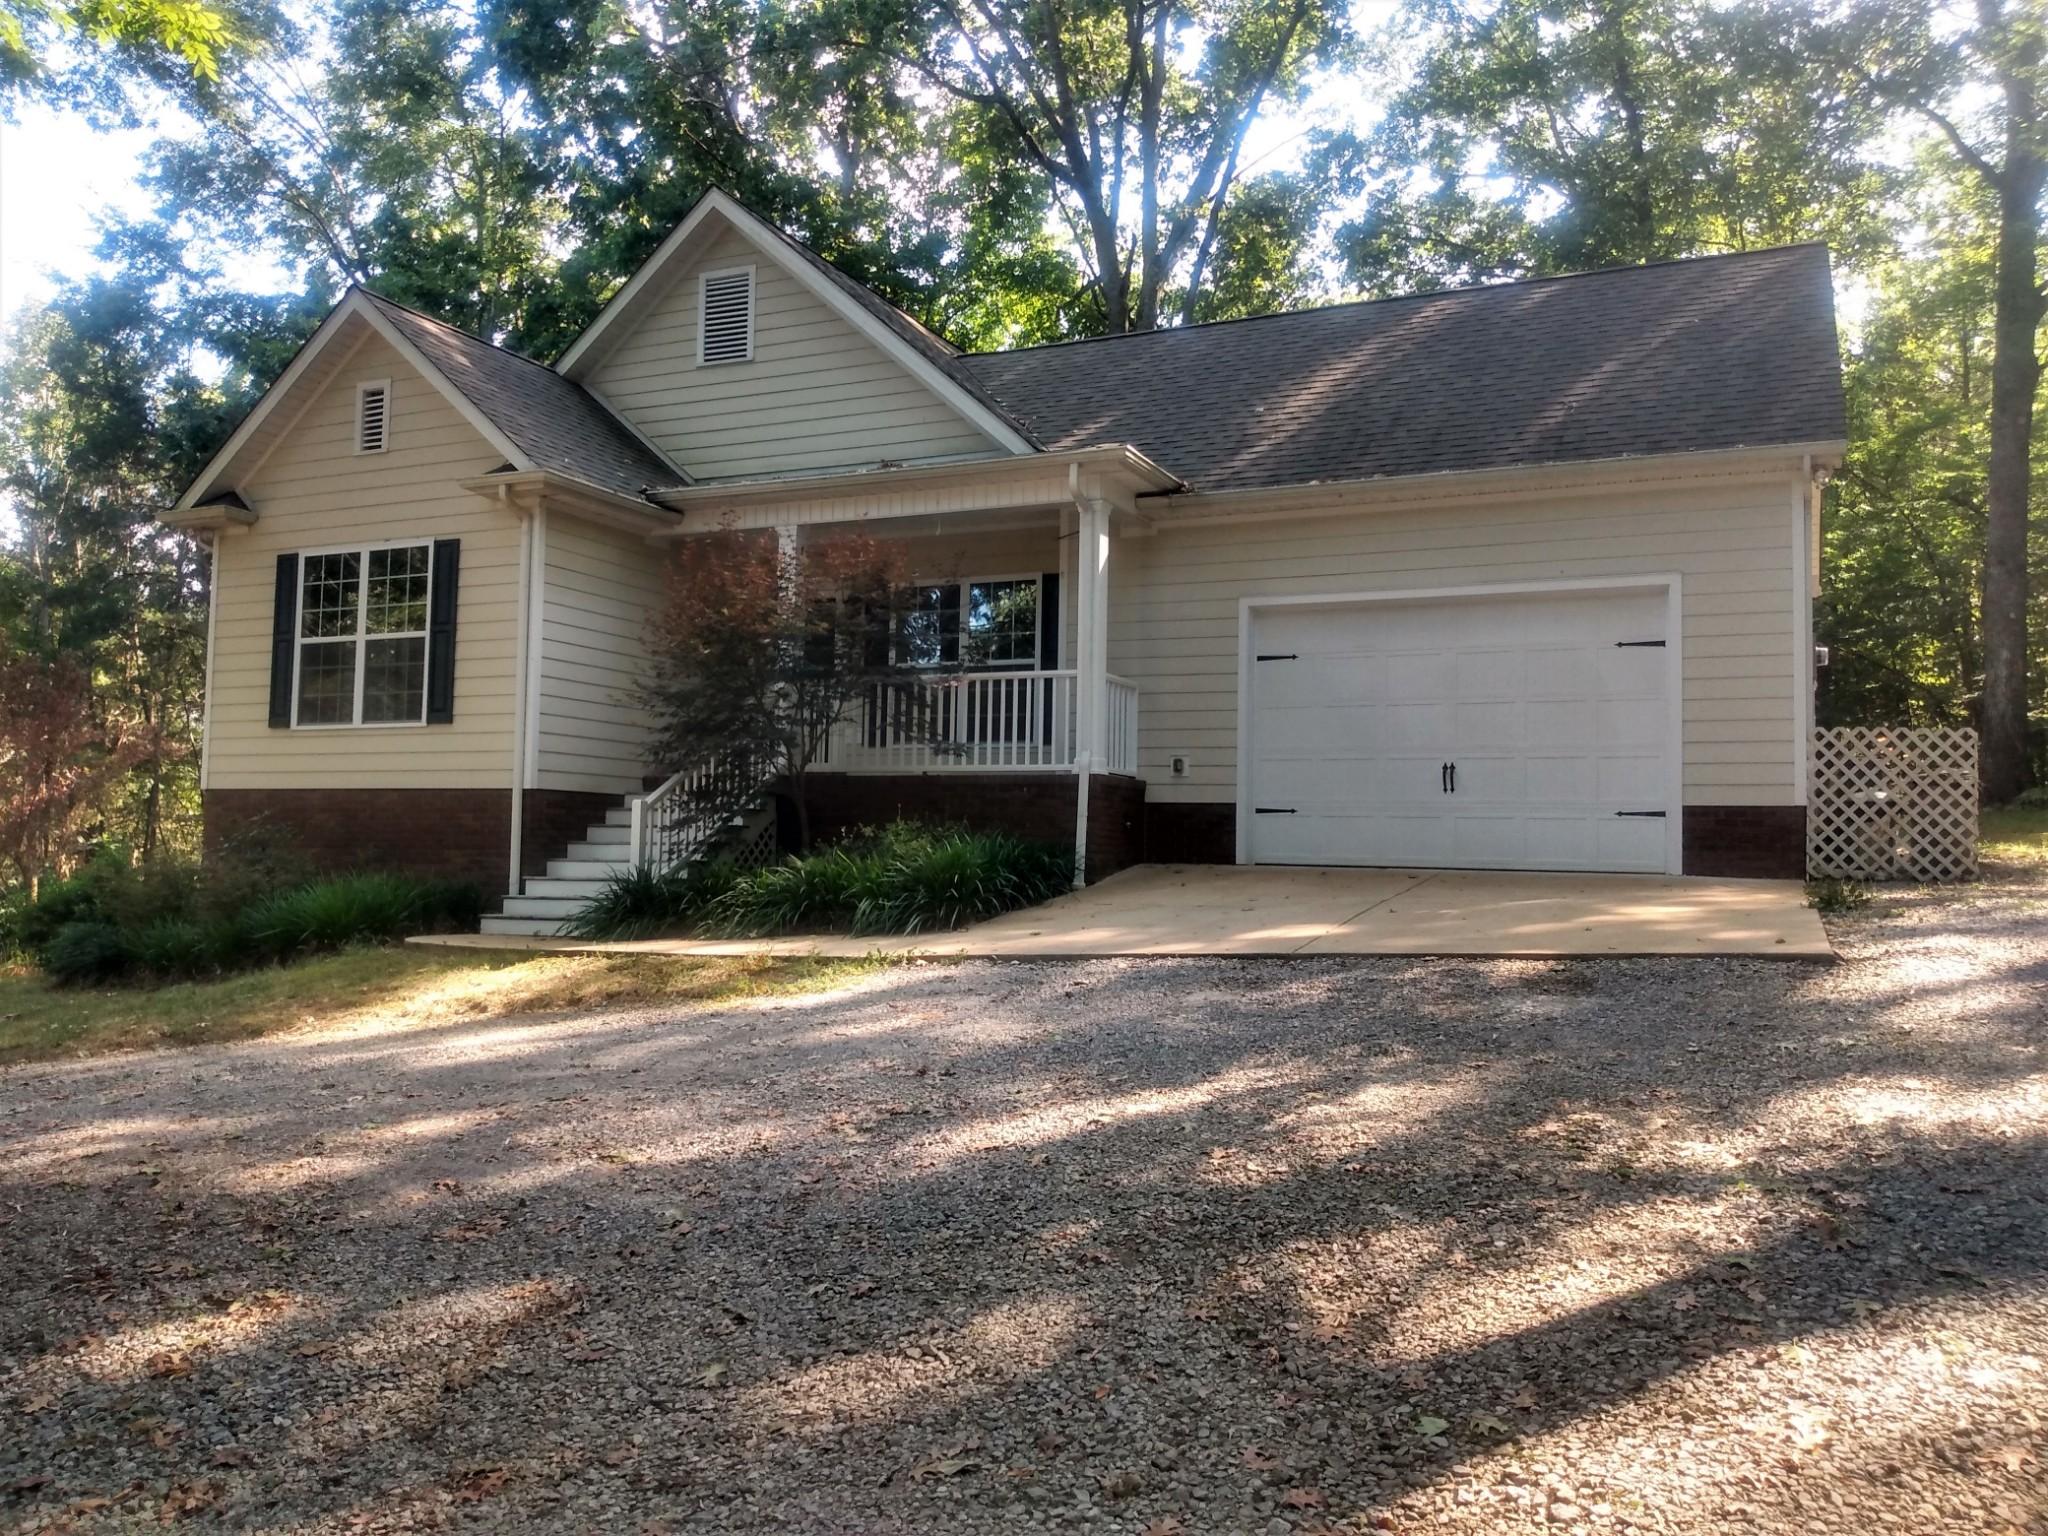 2821 Pulaski Hwy Property Photo - Frankewing, TN real estate listing